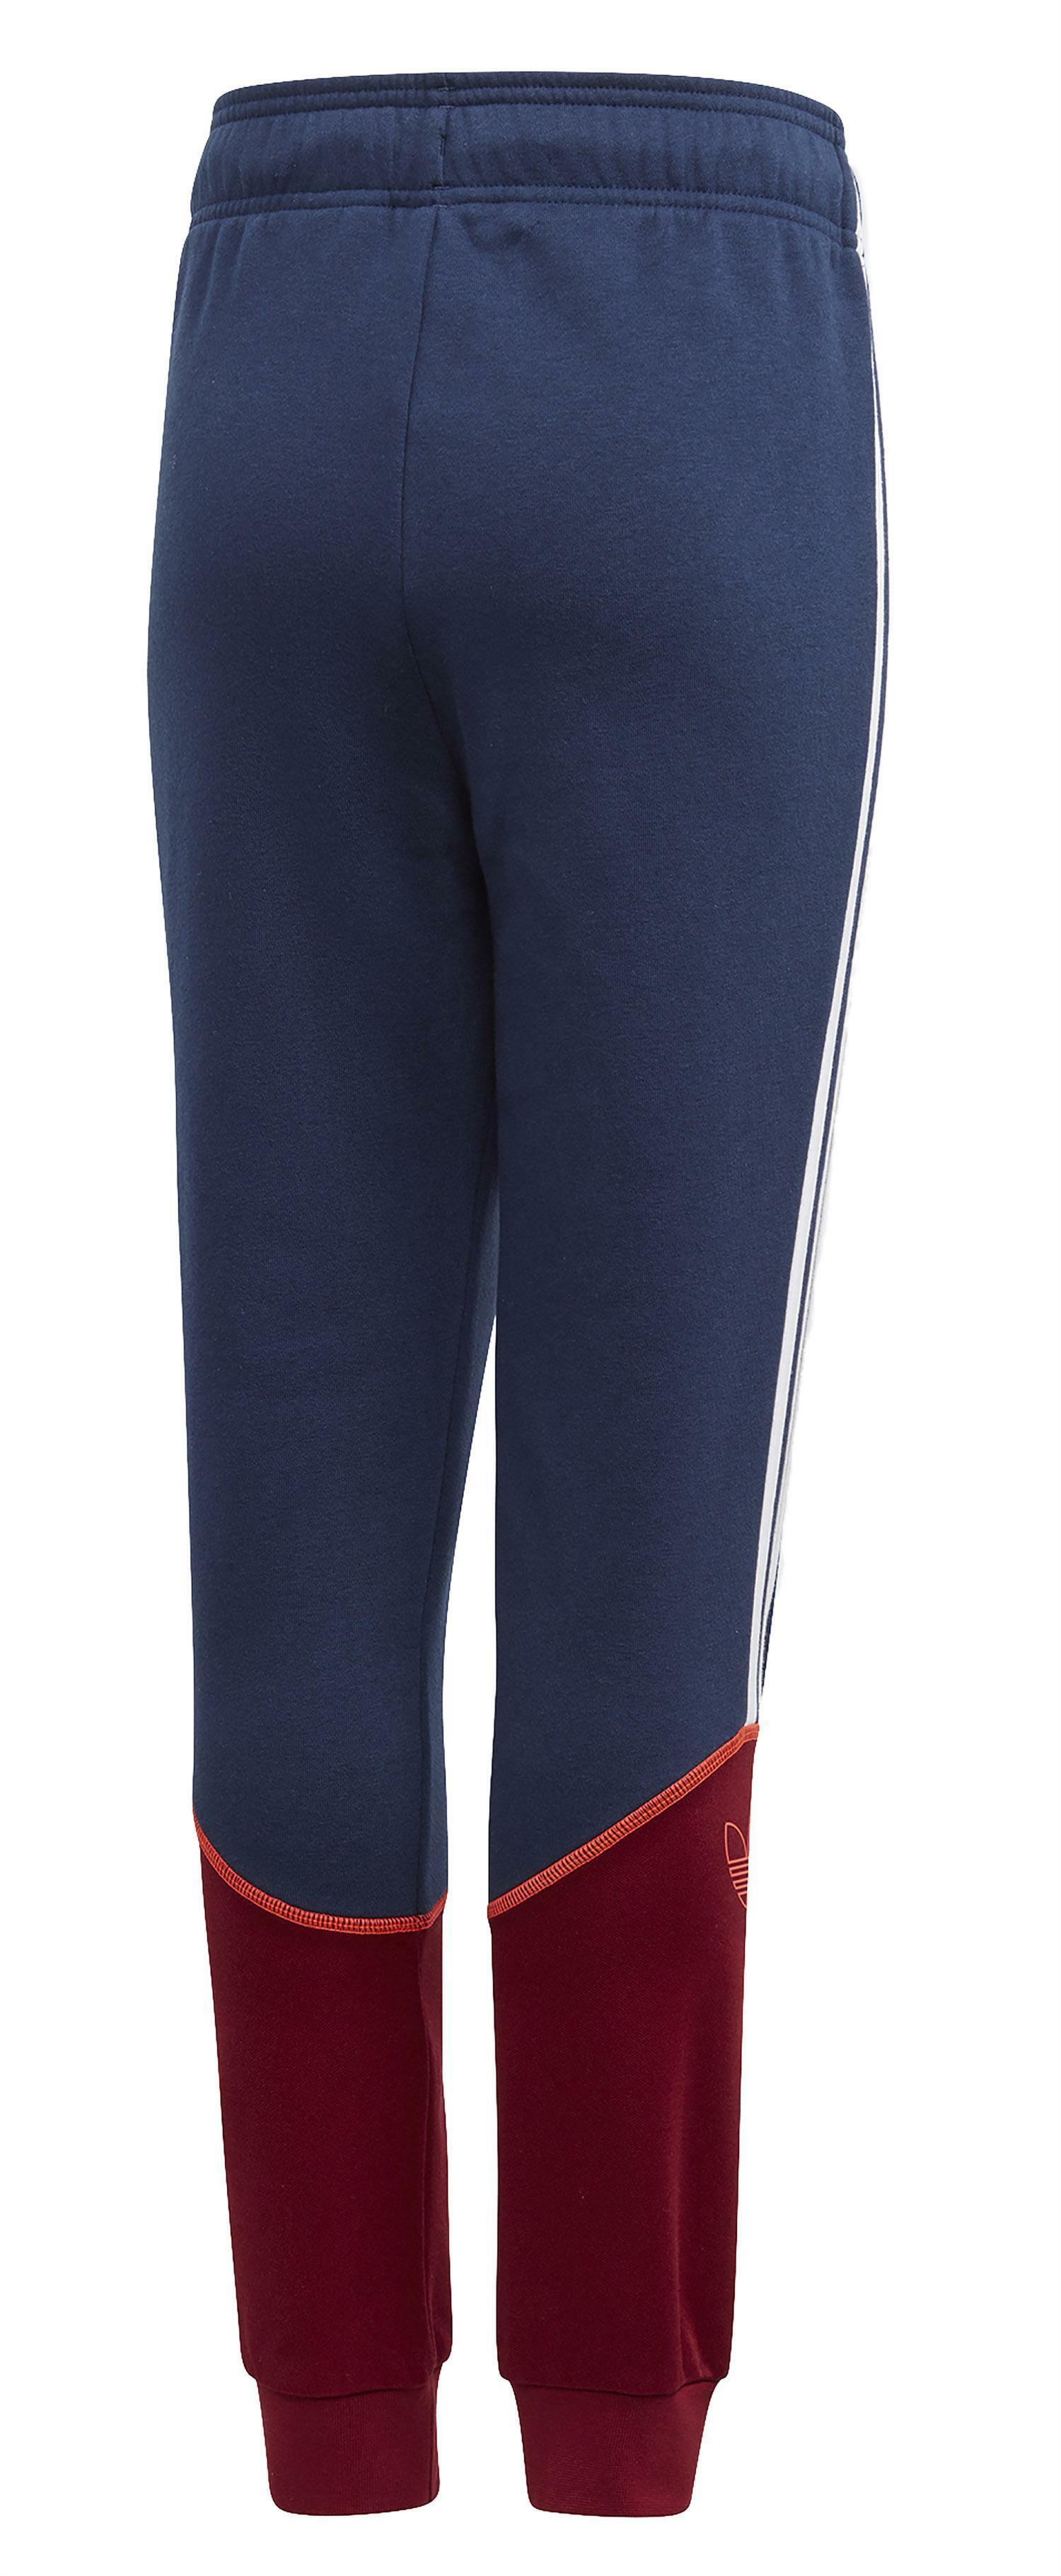 adidas adidas outline pantaloni bambino blu fm4472